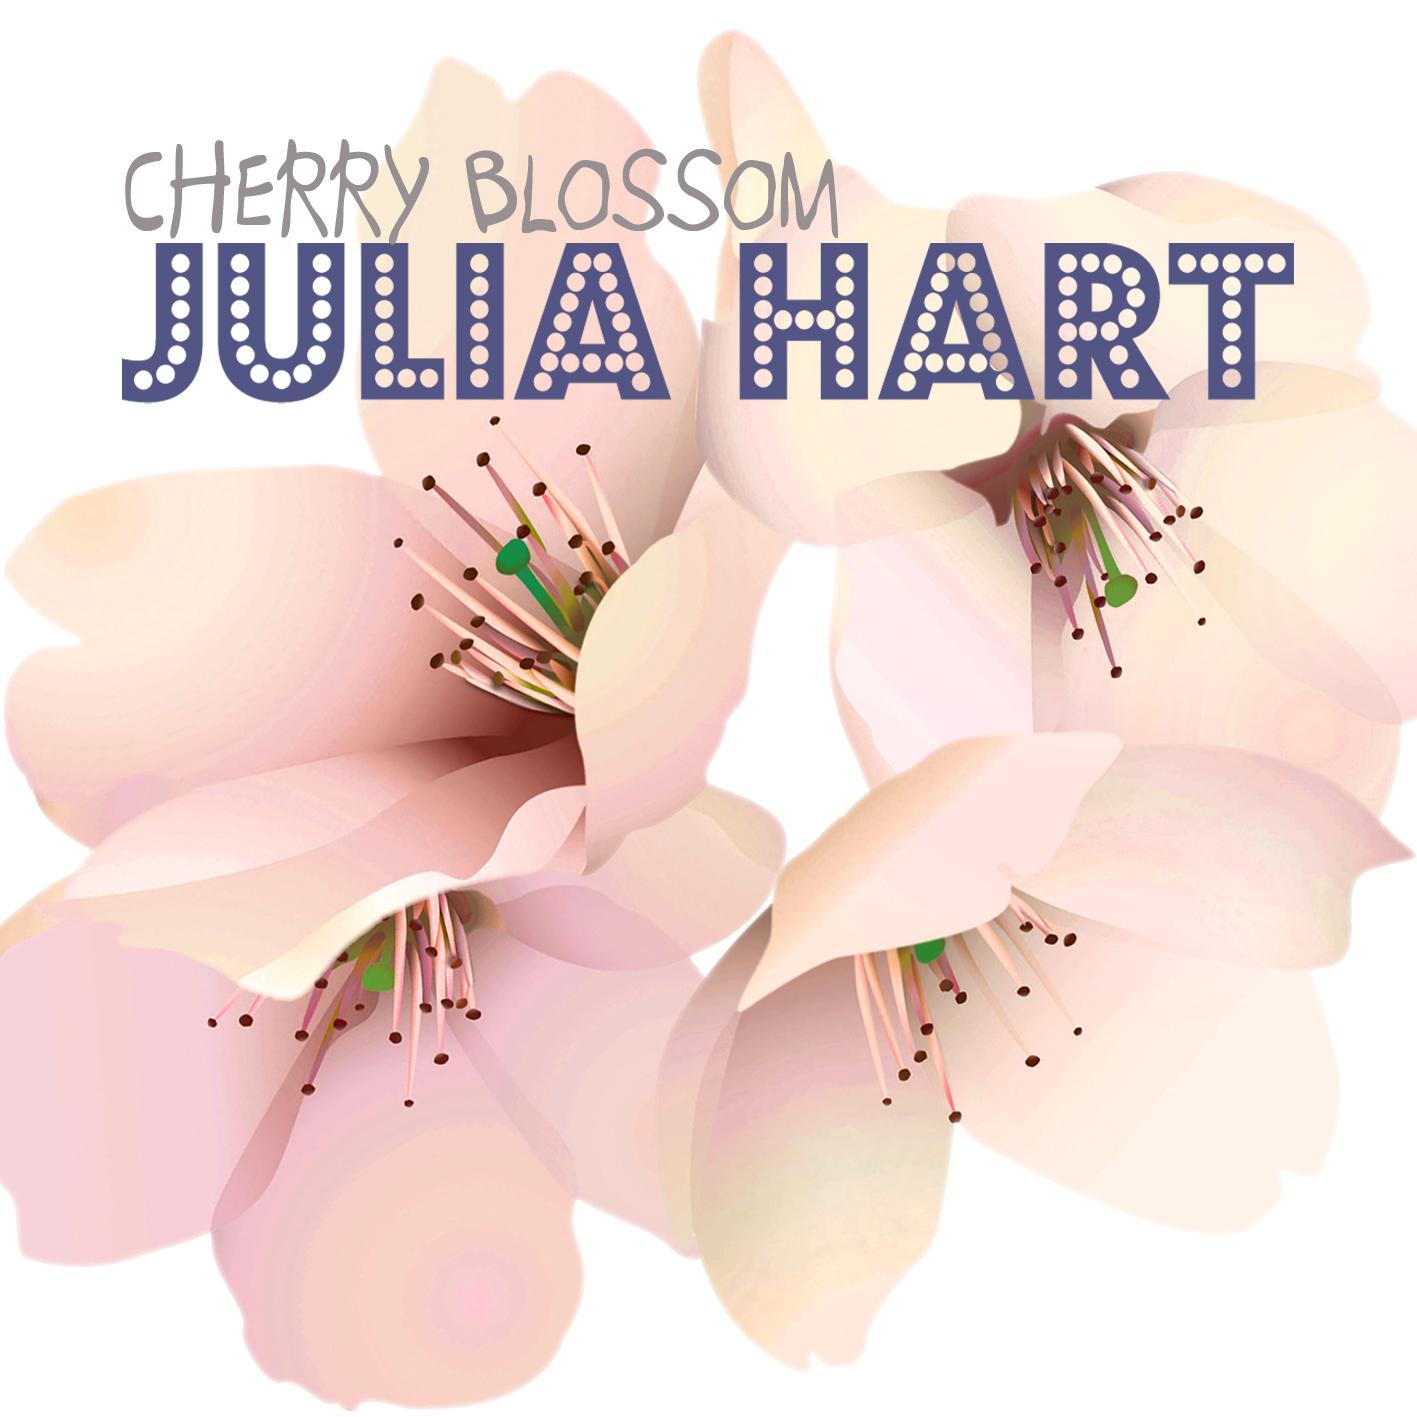 Julia Hart Release Reboot Digital Single for Spring